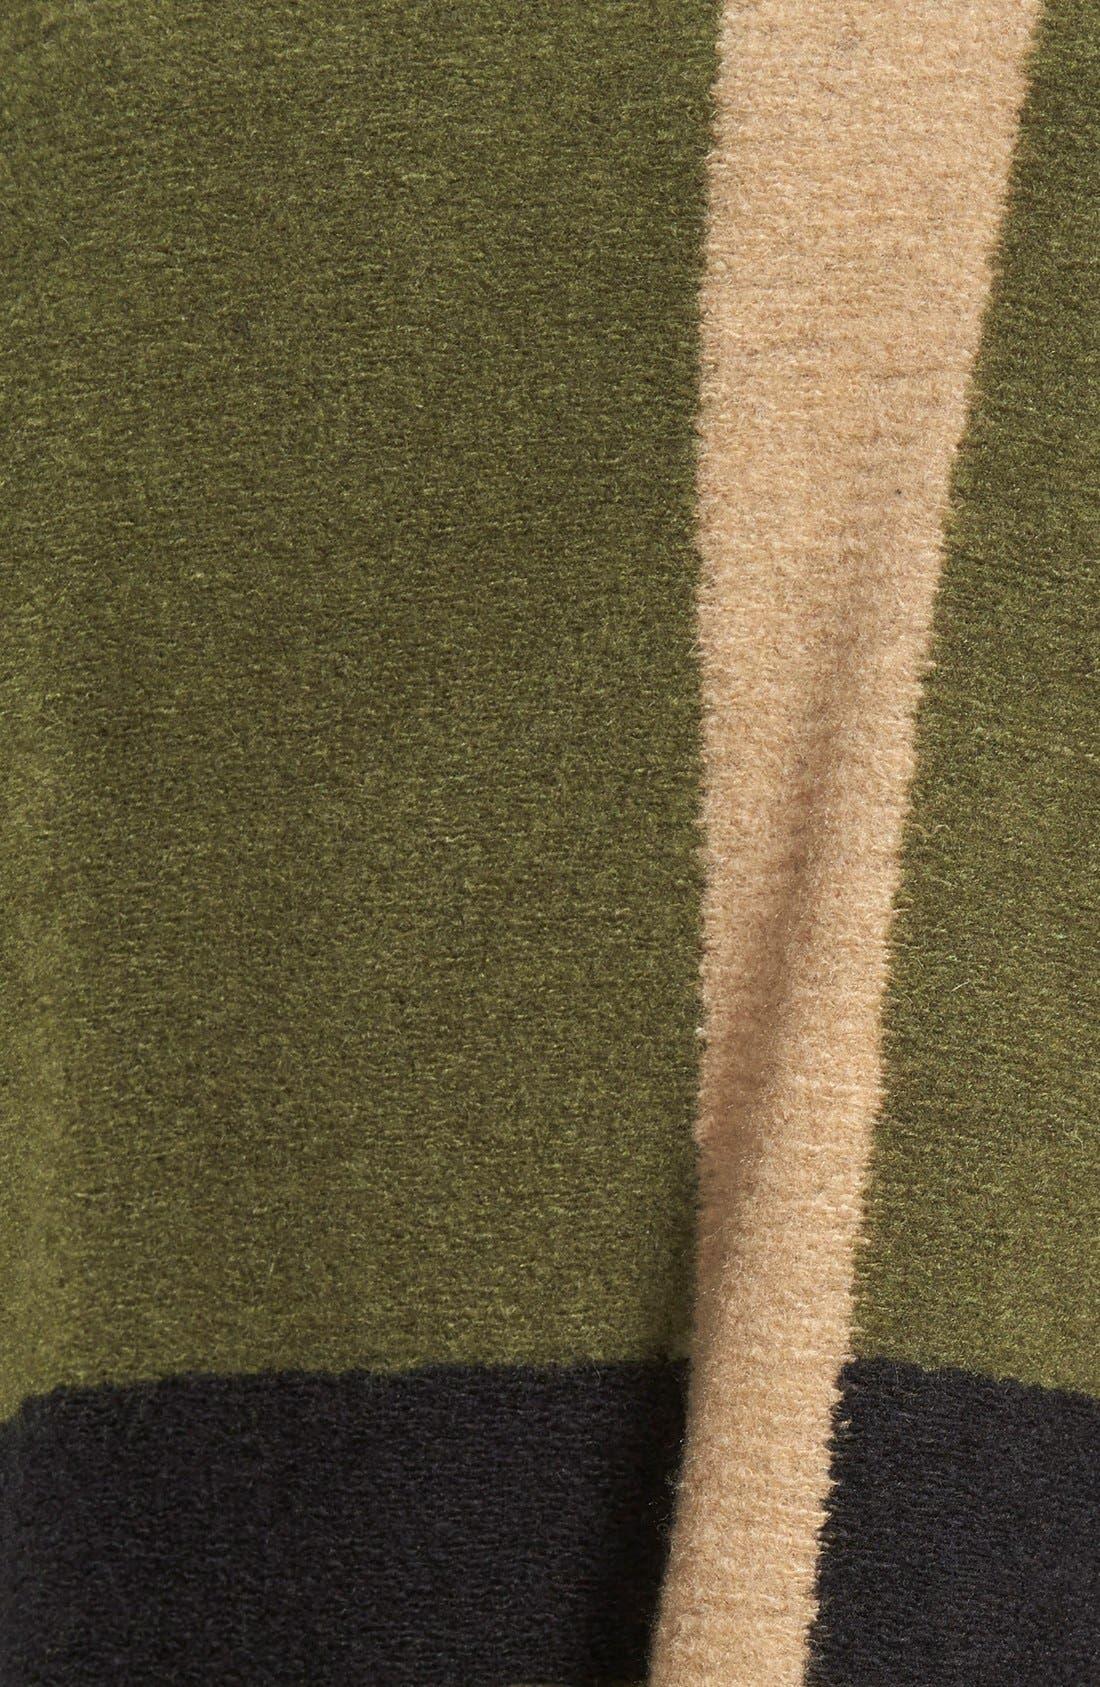 VINCE CAMUTO, Blanket Jacquard Poncho, Alternate thumbnail 3, color, 342